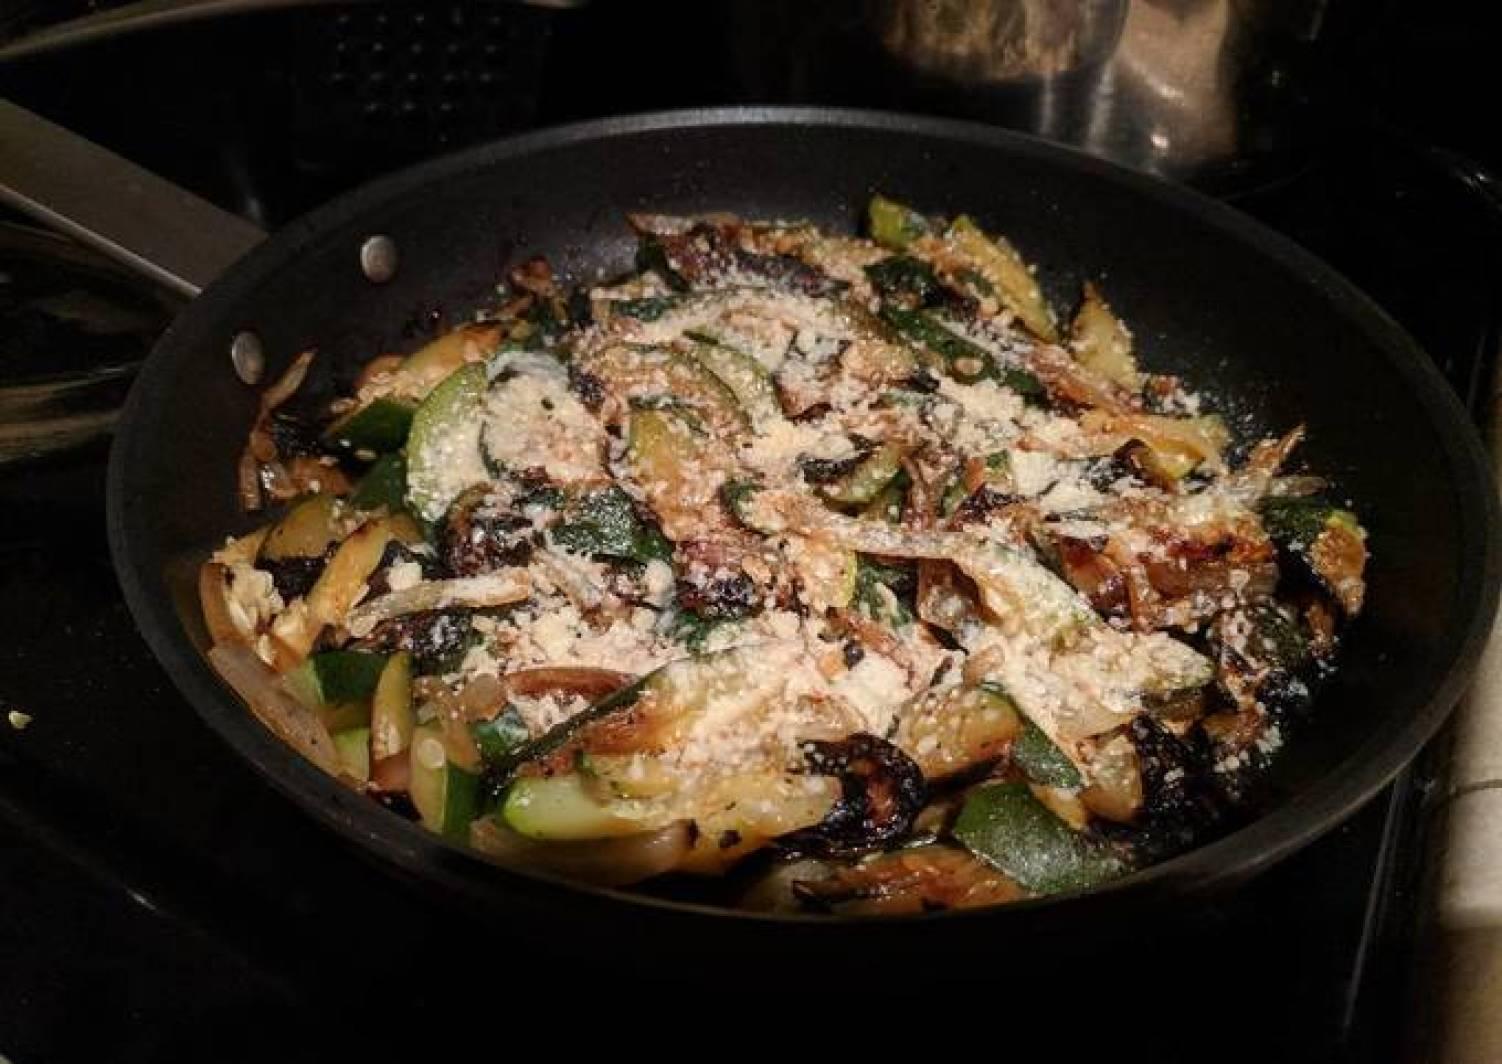 Pan-fried Zucchini Gratin